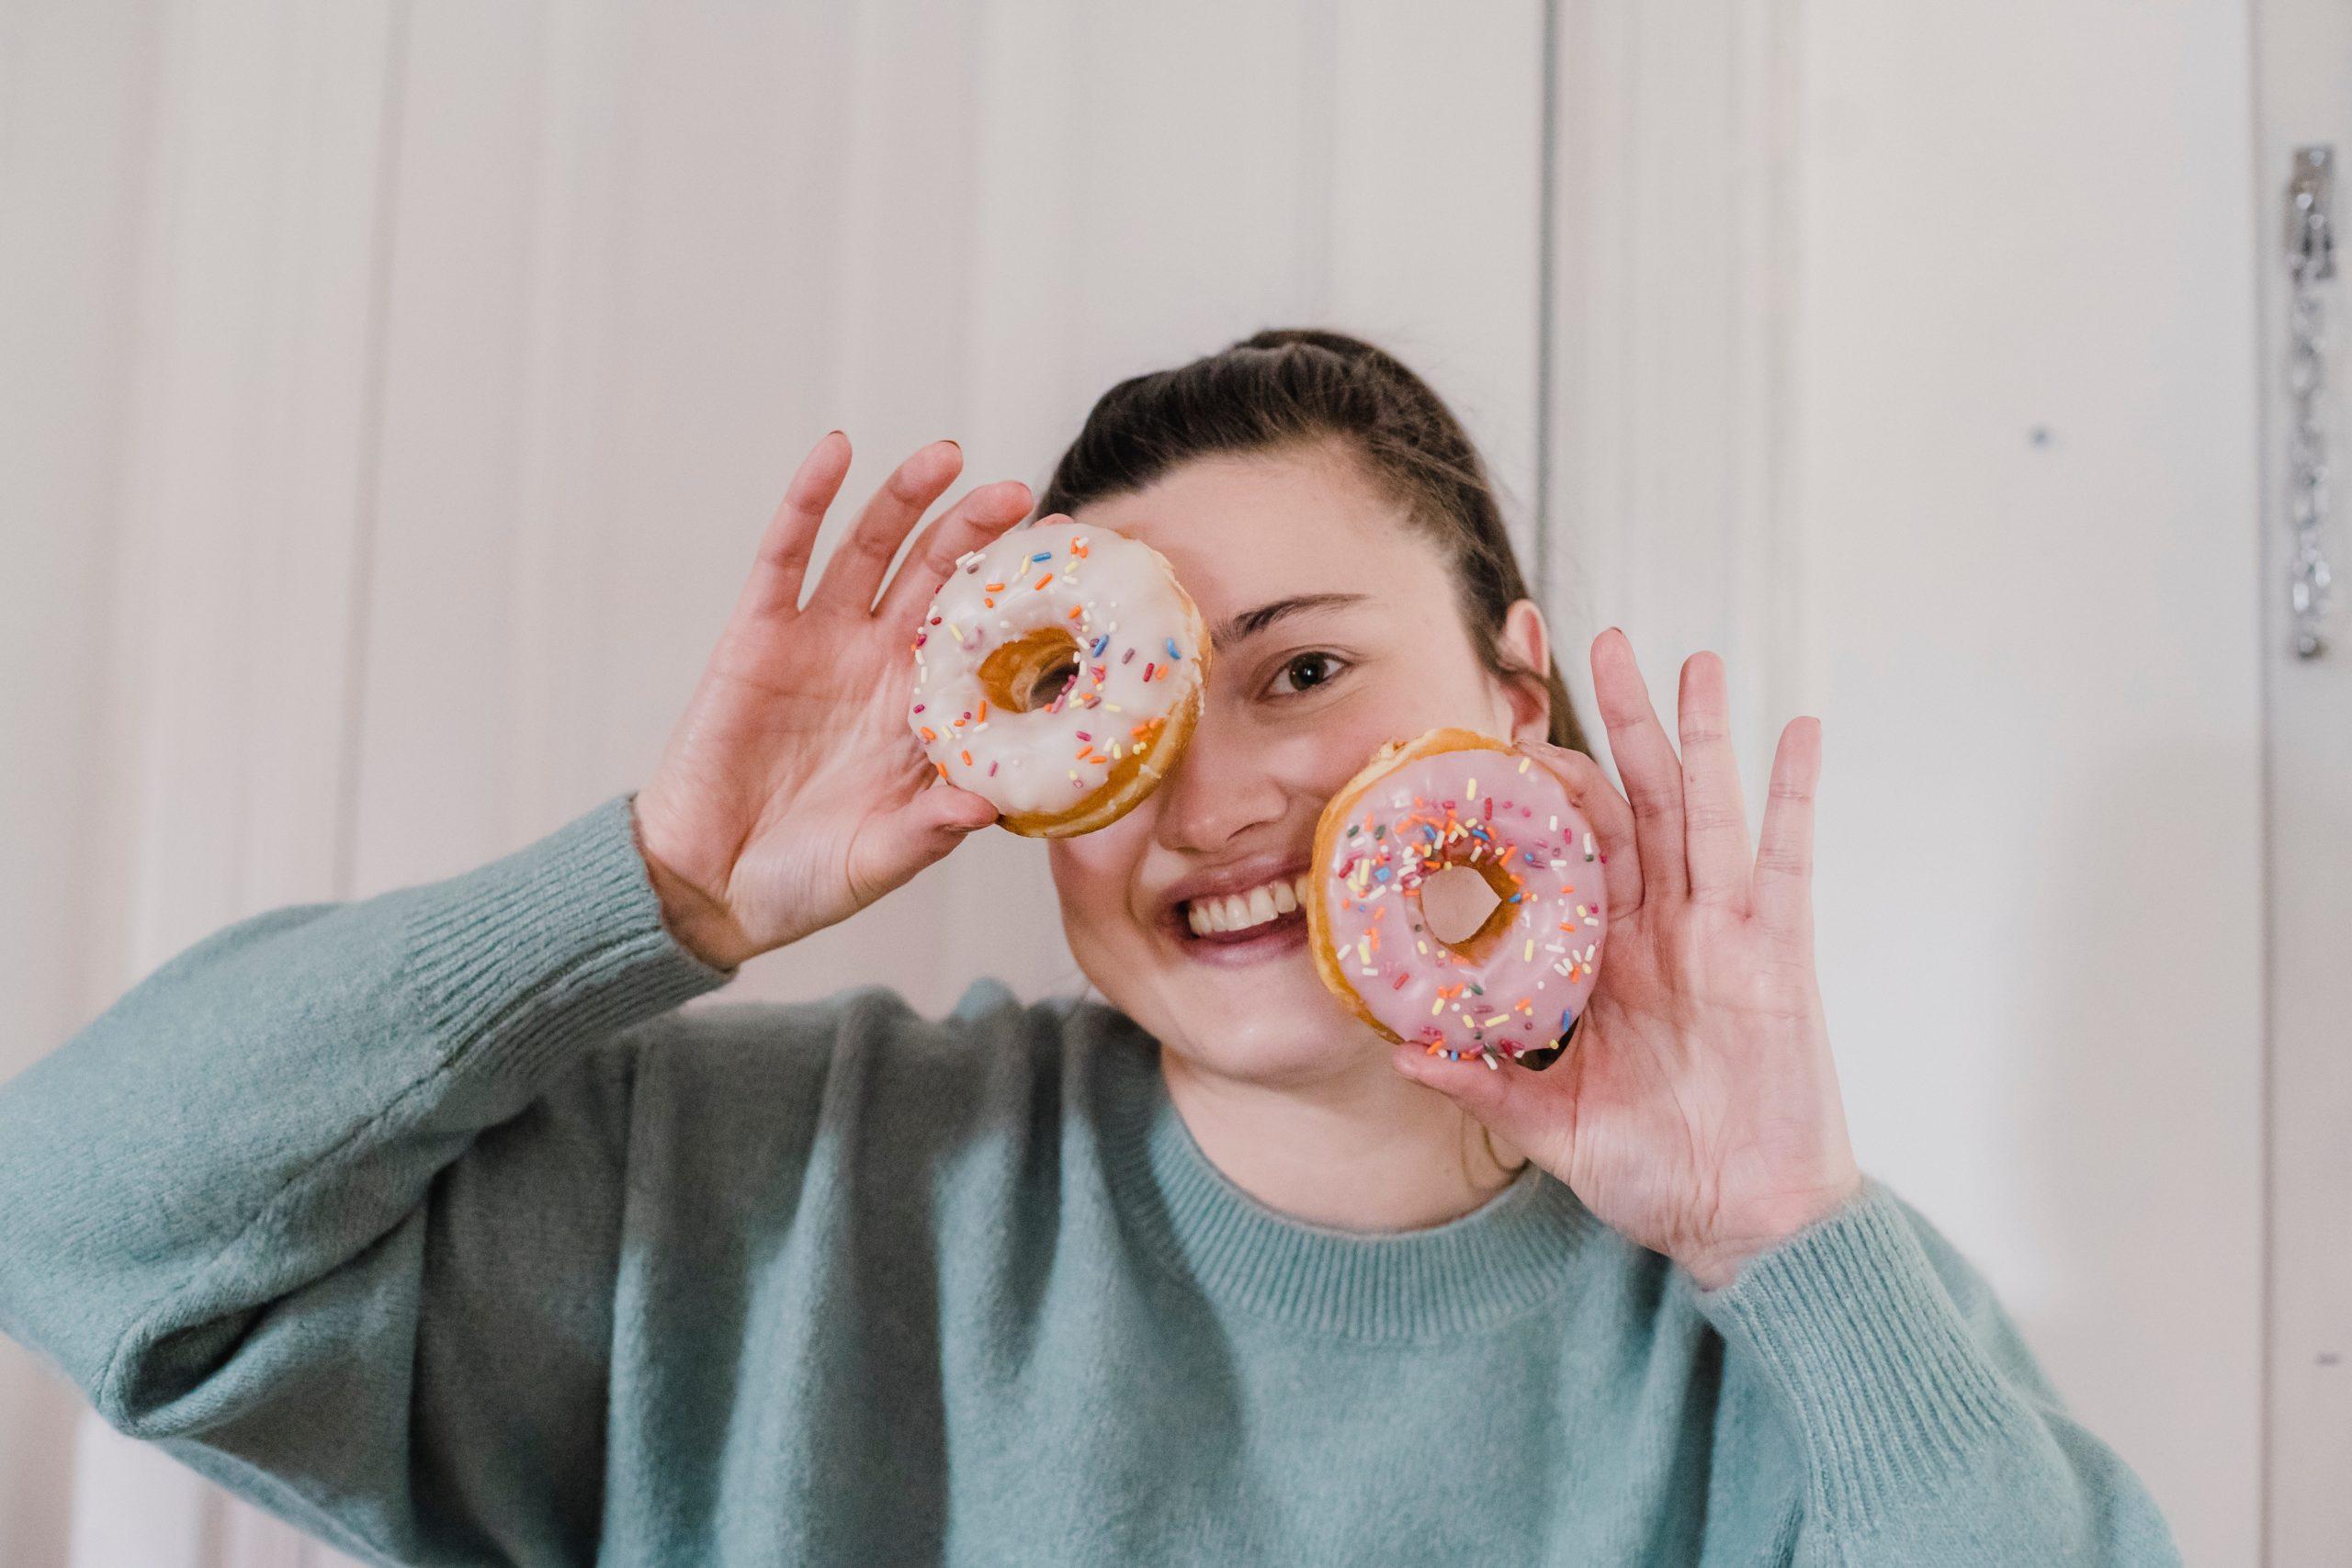 Isomaltooligosaccharide is a low-calorie sweetener